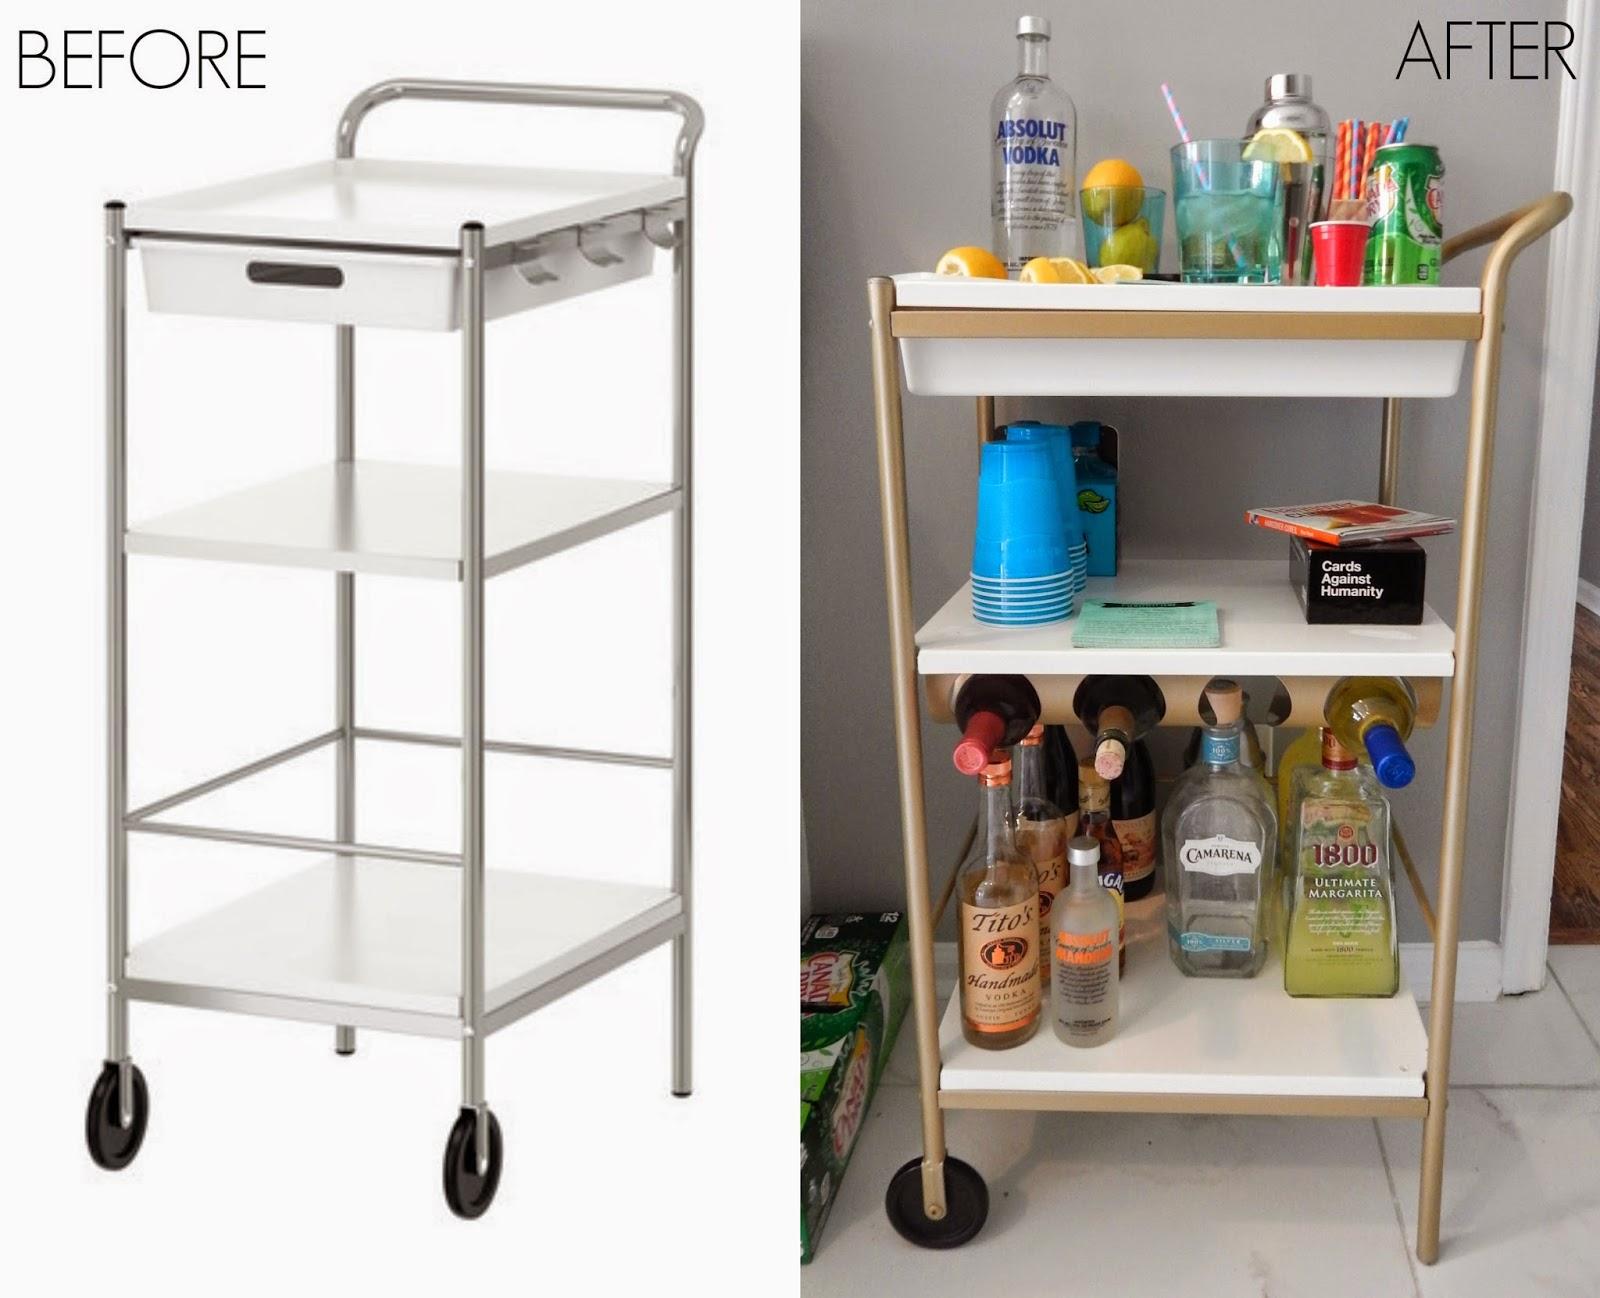 Ikea Bygel Kitchen Utility Cart Island Organizer Dark